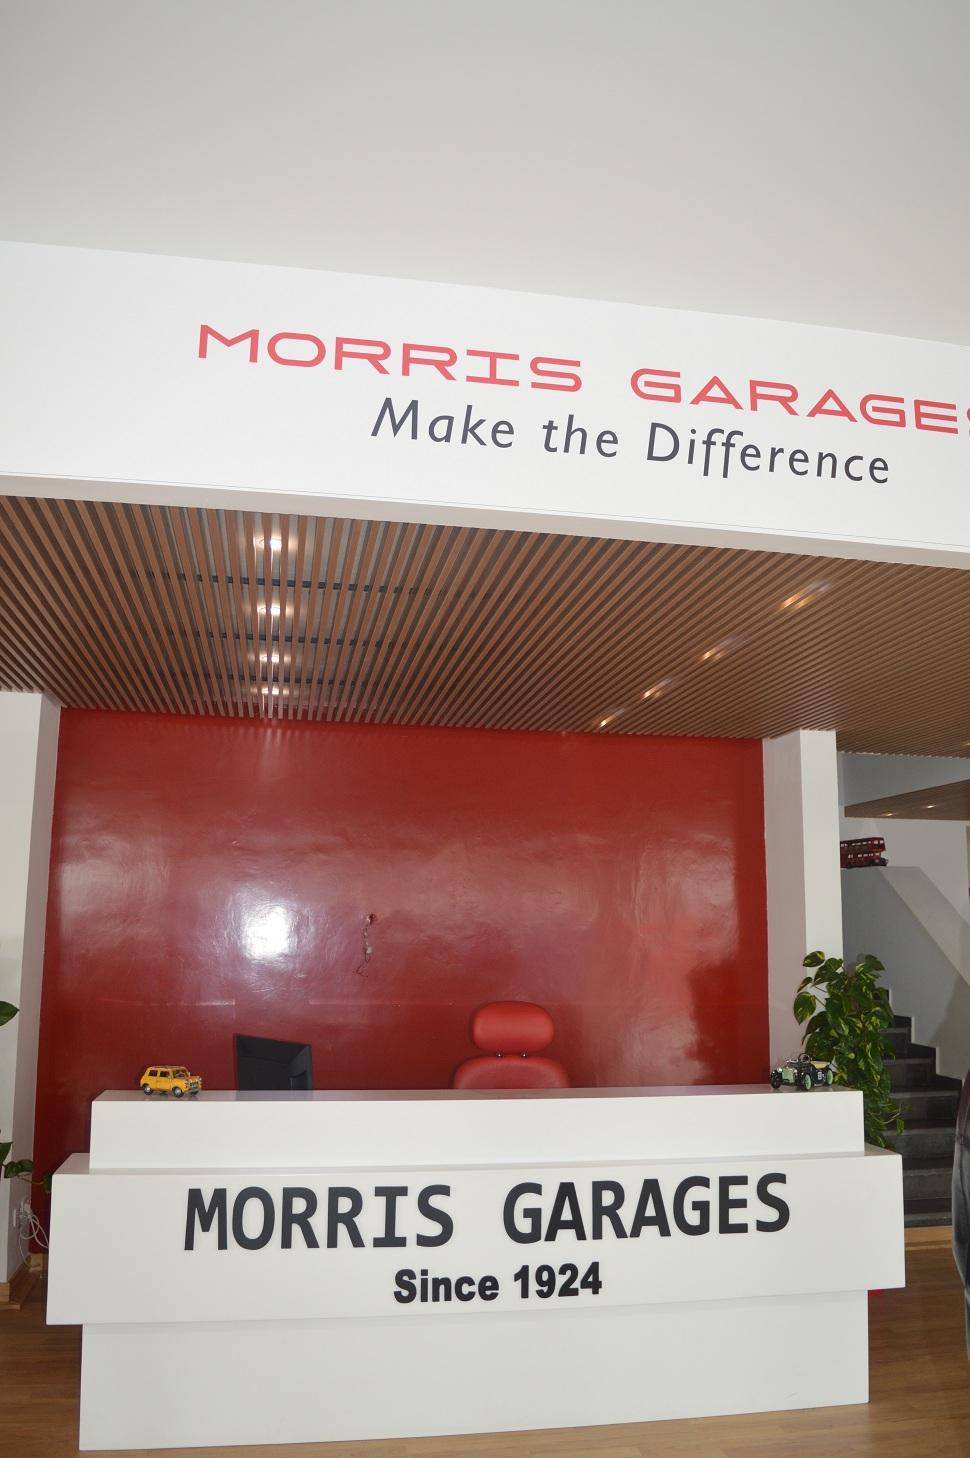 acheter_morris_garages_charguia